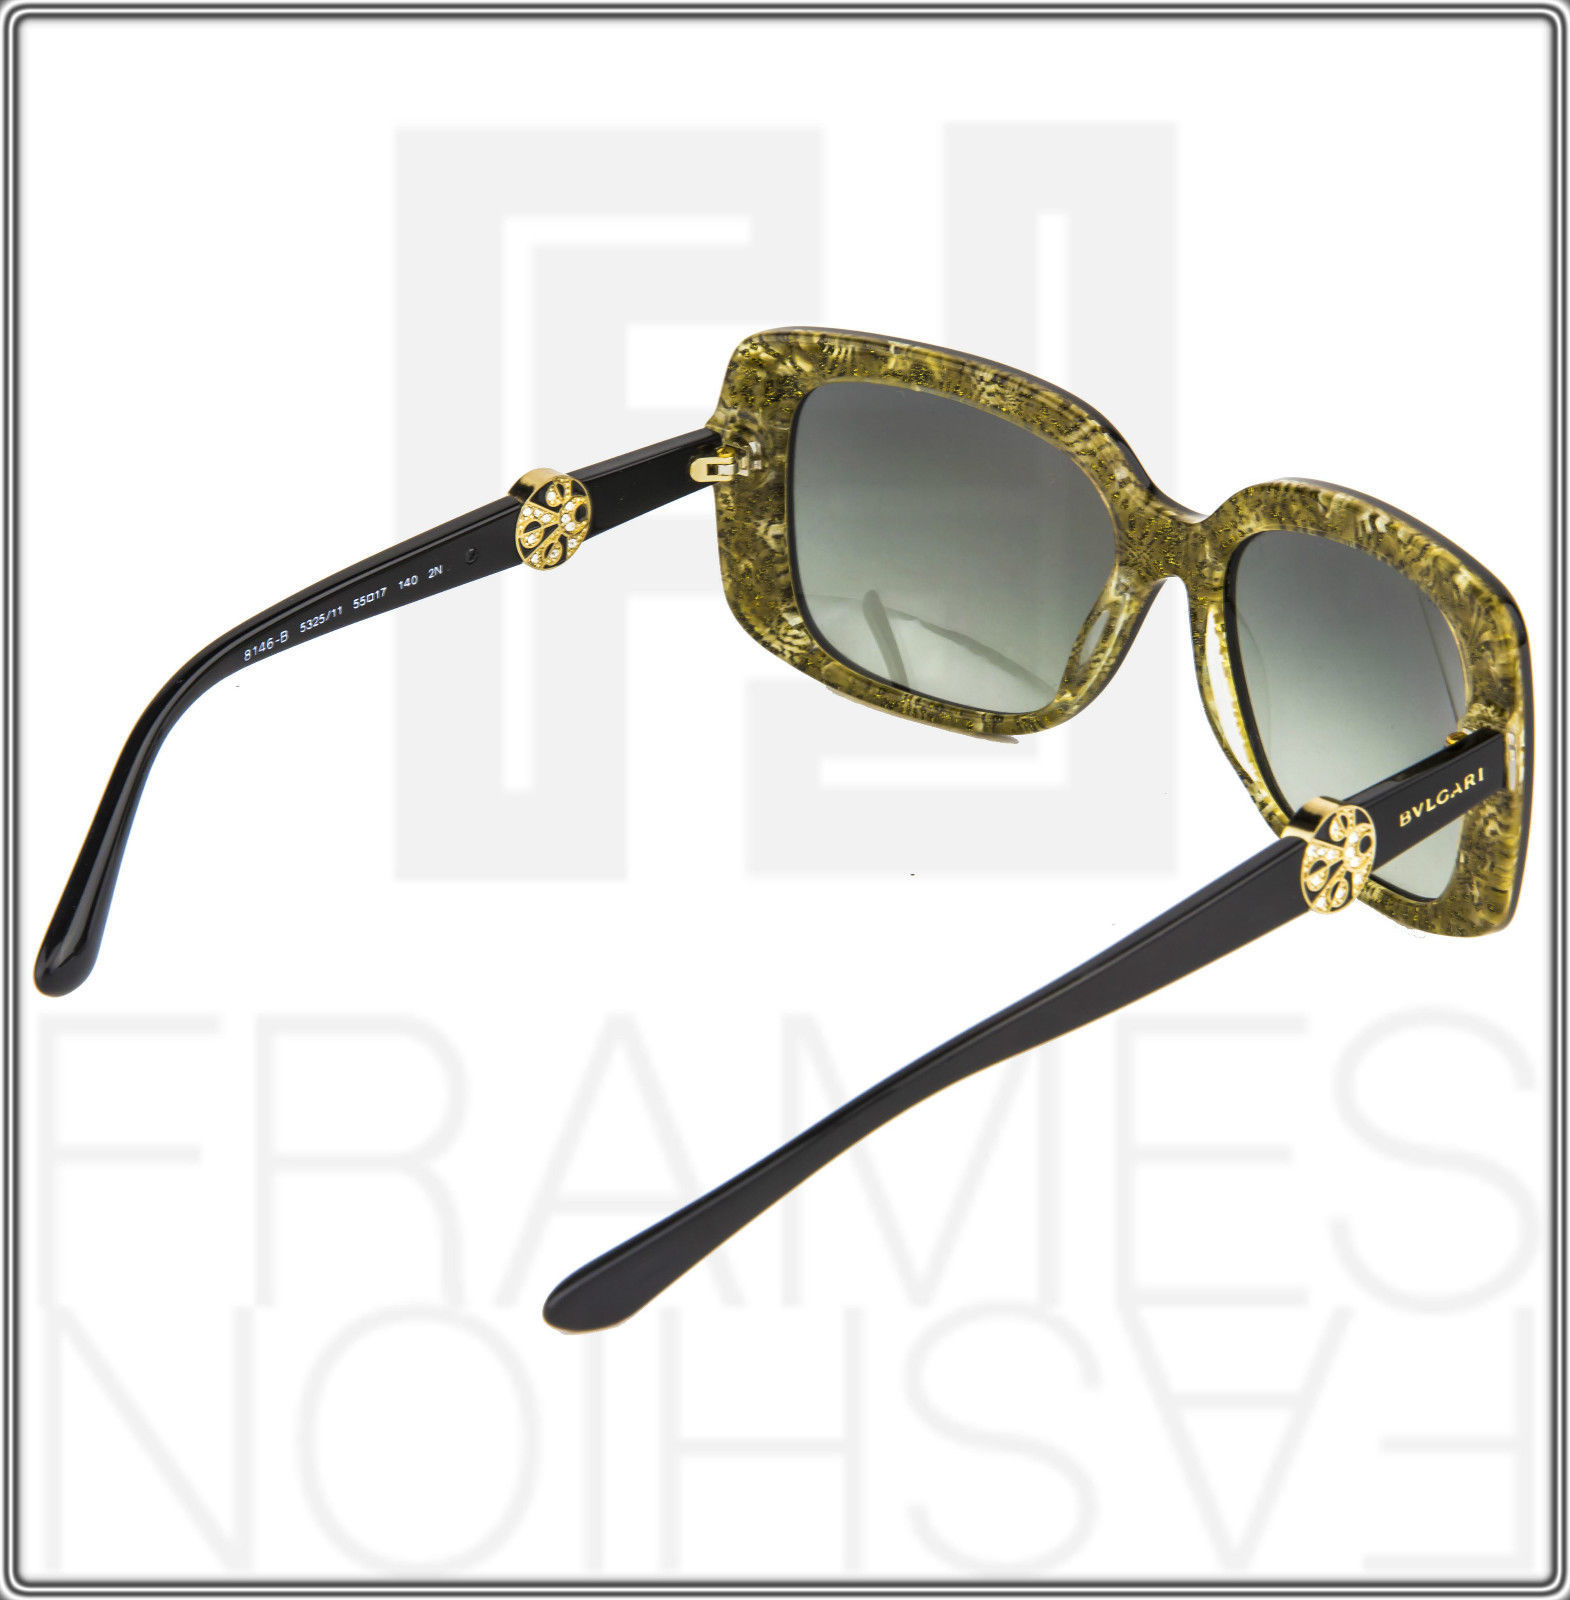 BVLGARI INTARSIO 8146B 5325/11 Black Gold Sunglasses 8146 Square Women Gradient image 5